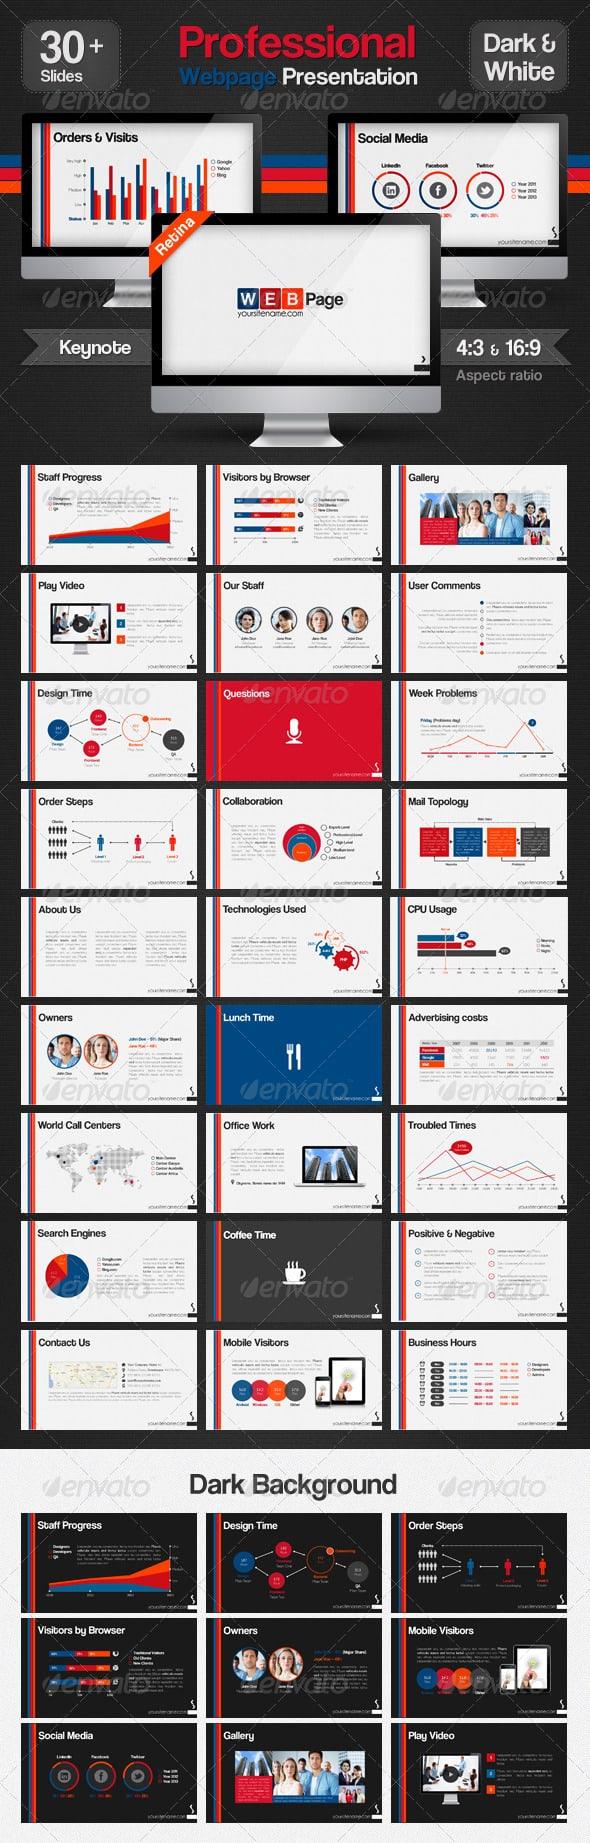 Professional-Web Page-Presentation-Keynote-template